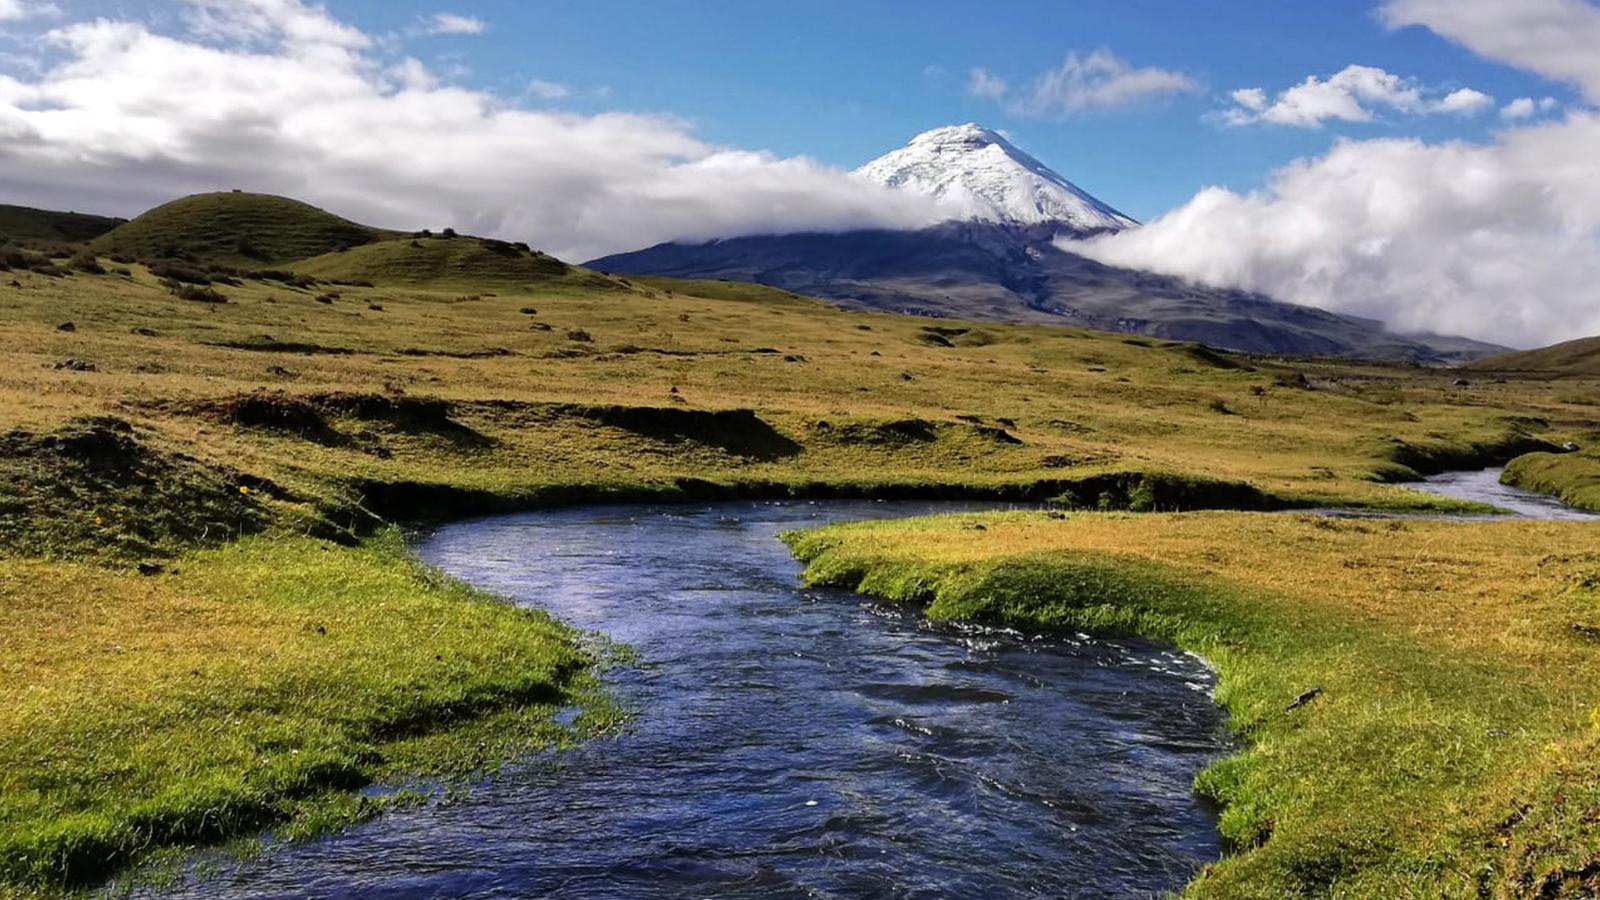 ecuador-amazon-hotsprings-volcanoes-new.jpg